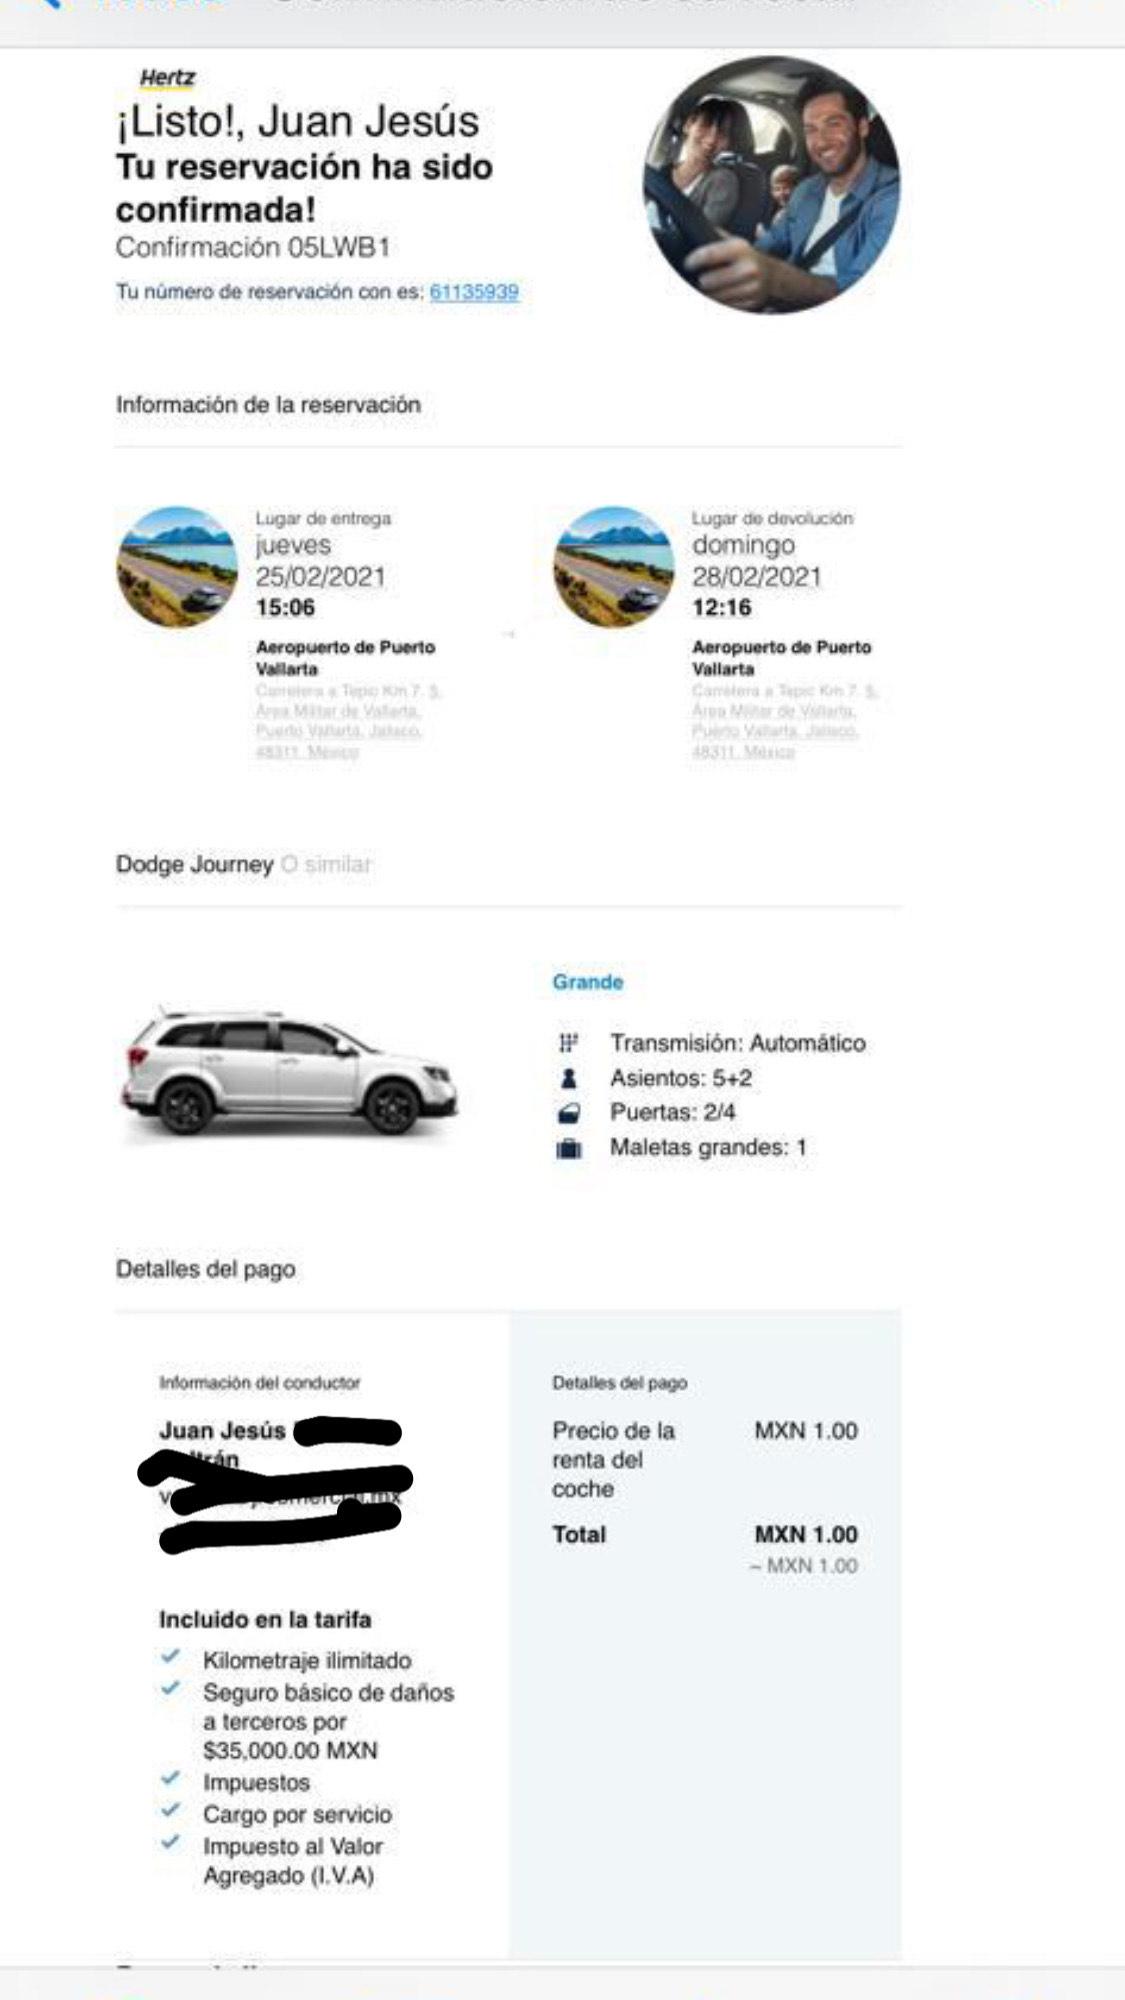 Hertz Renta Dodge Journey o similar $0.33 / día